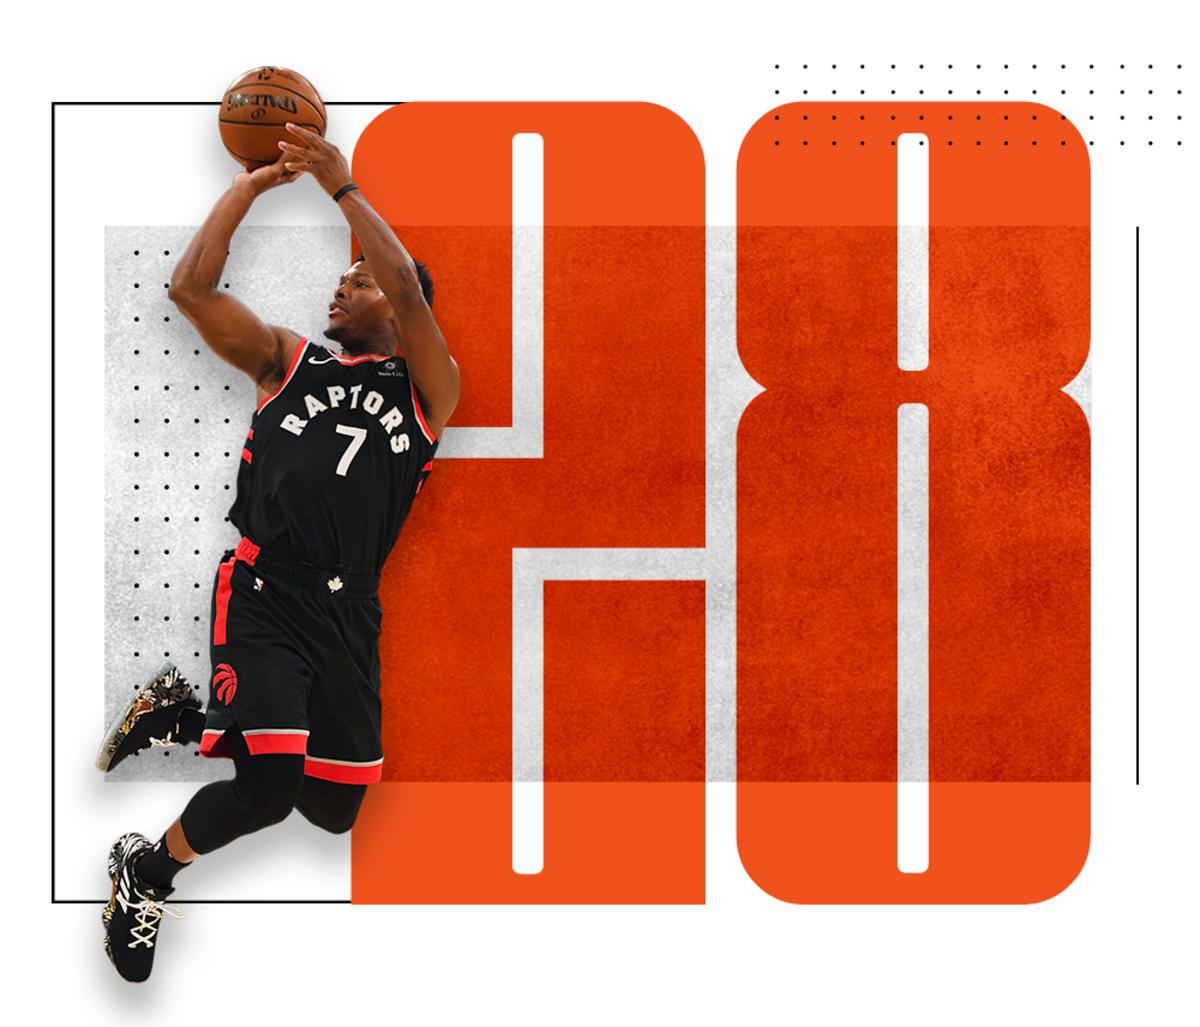 top-100-nba-players-2020-Kyle-lowry.png